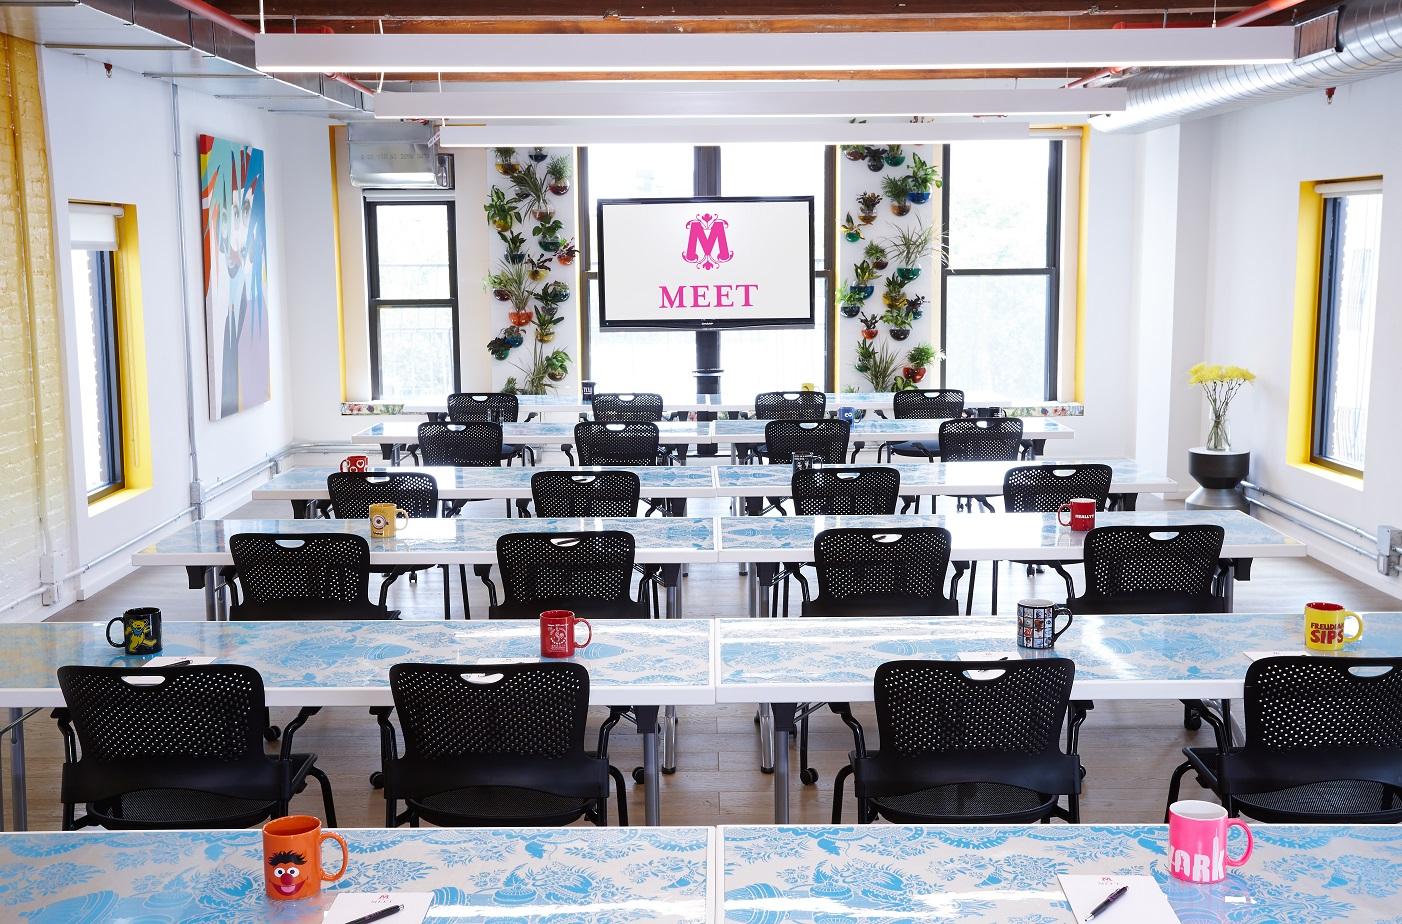 MEET-on-Bowery-Classroom-Set-up-with-mugs.jpg